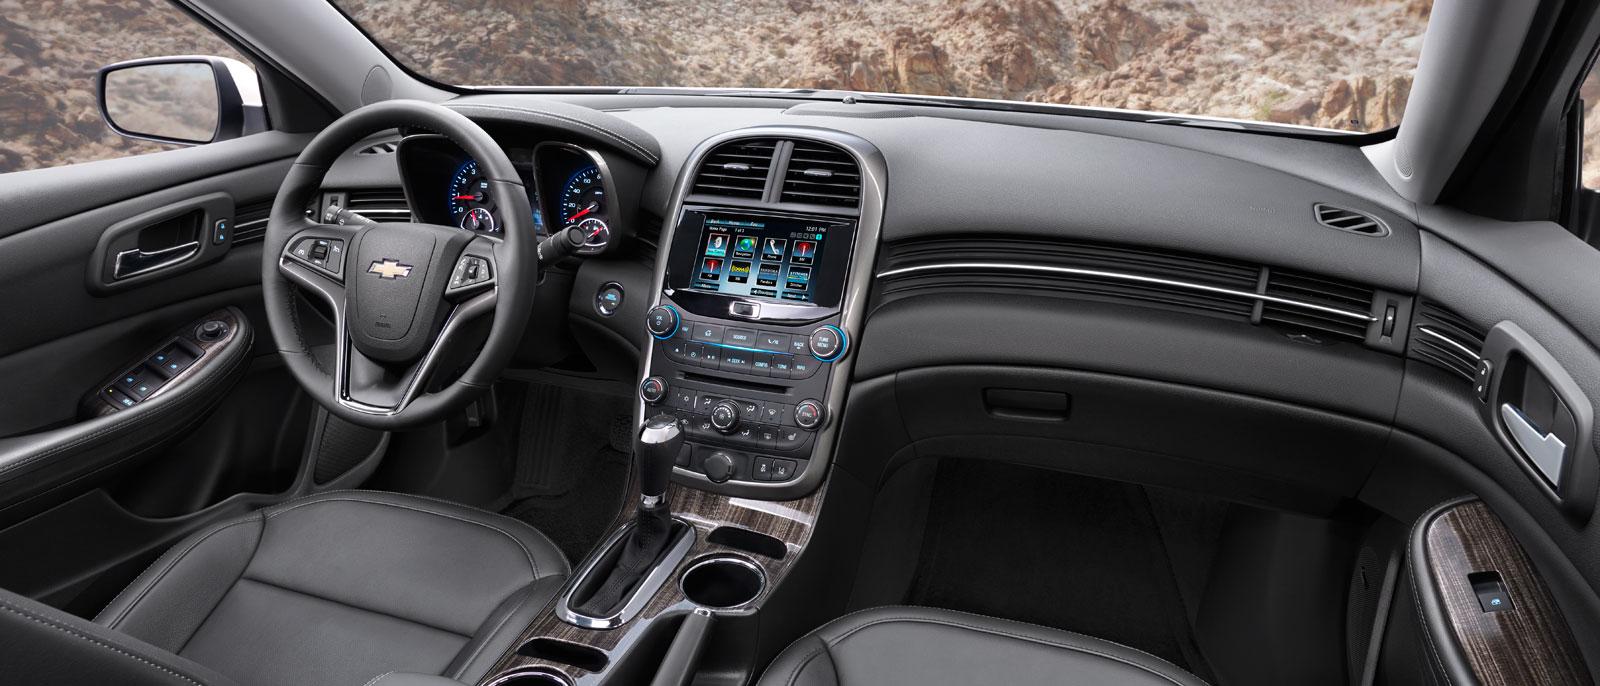 2015 Chevy Malibu